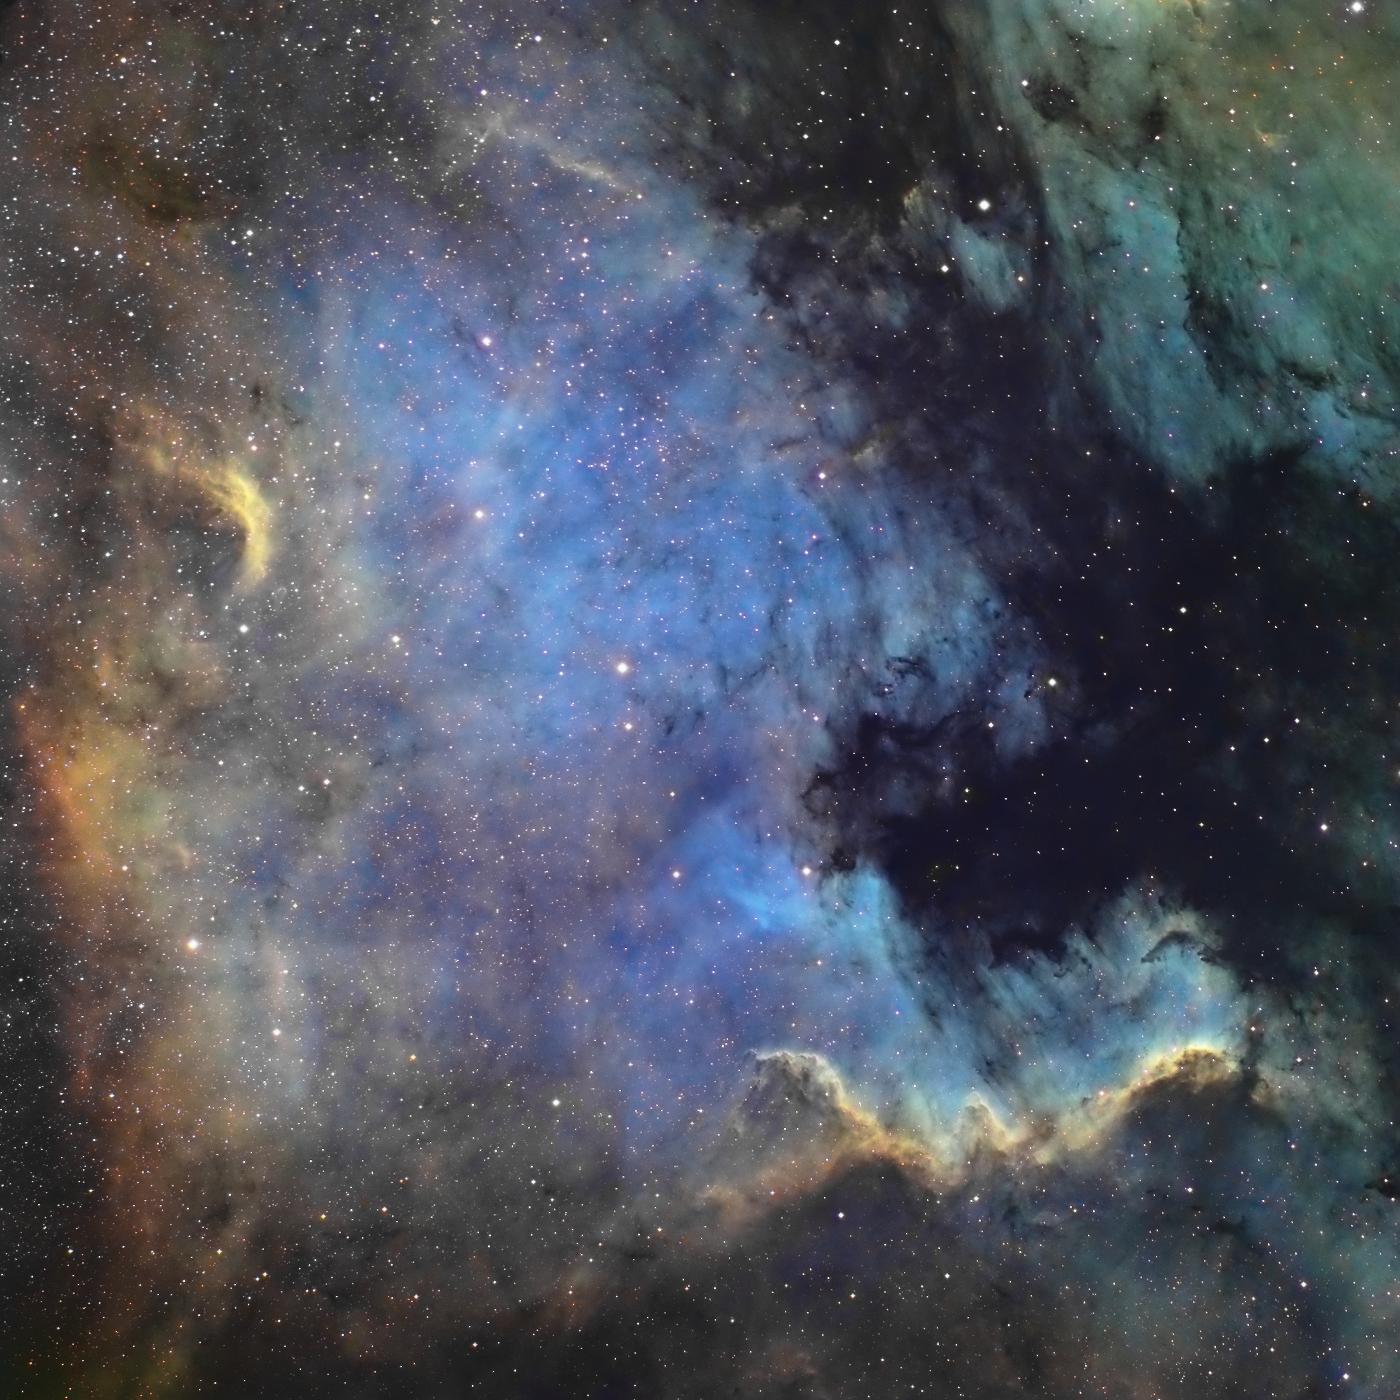 La nébuleuse North America NGC 7000